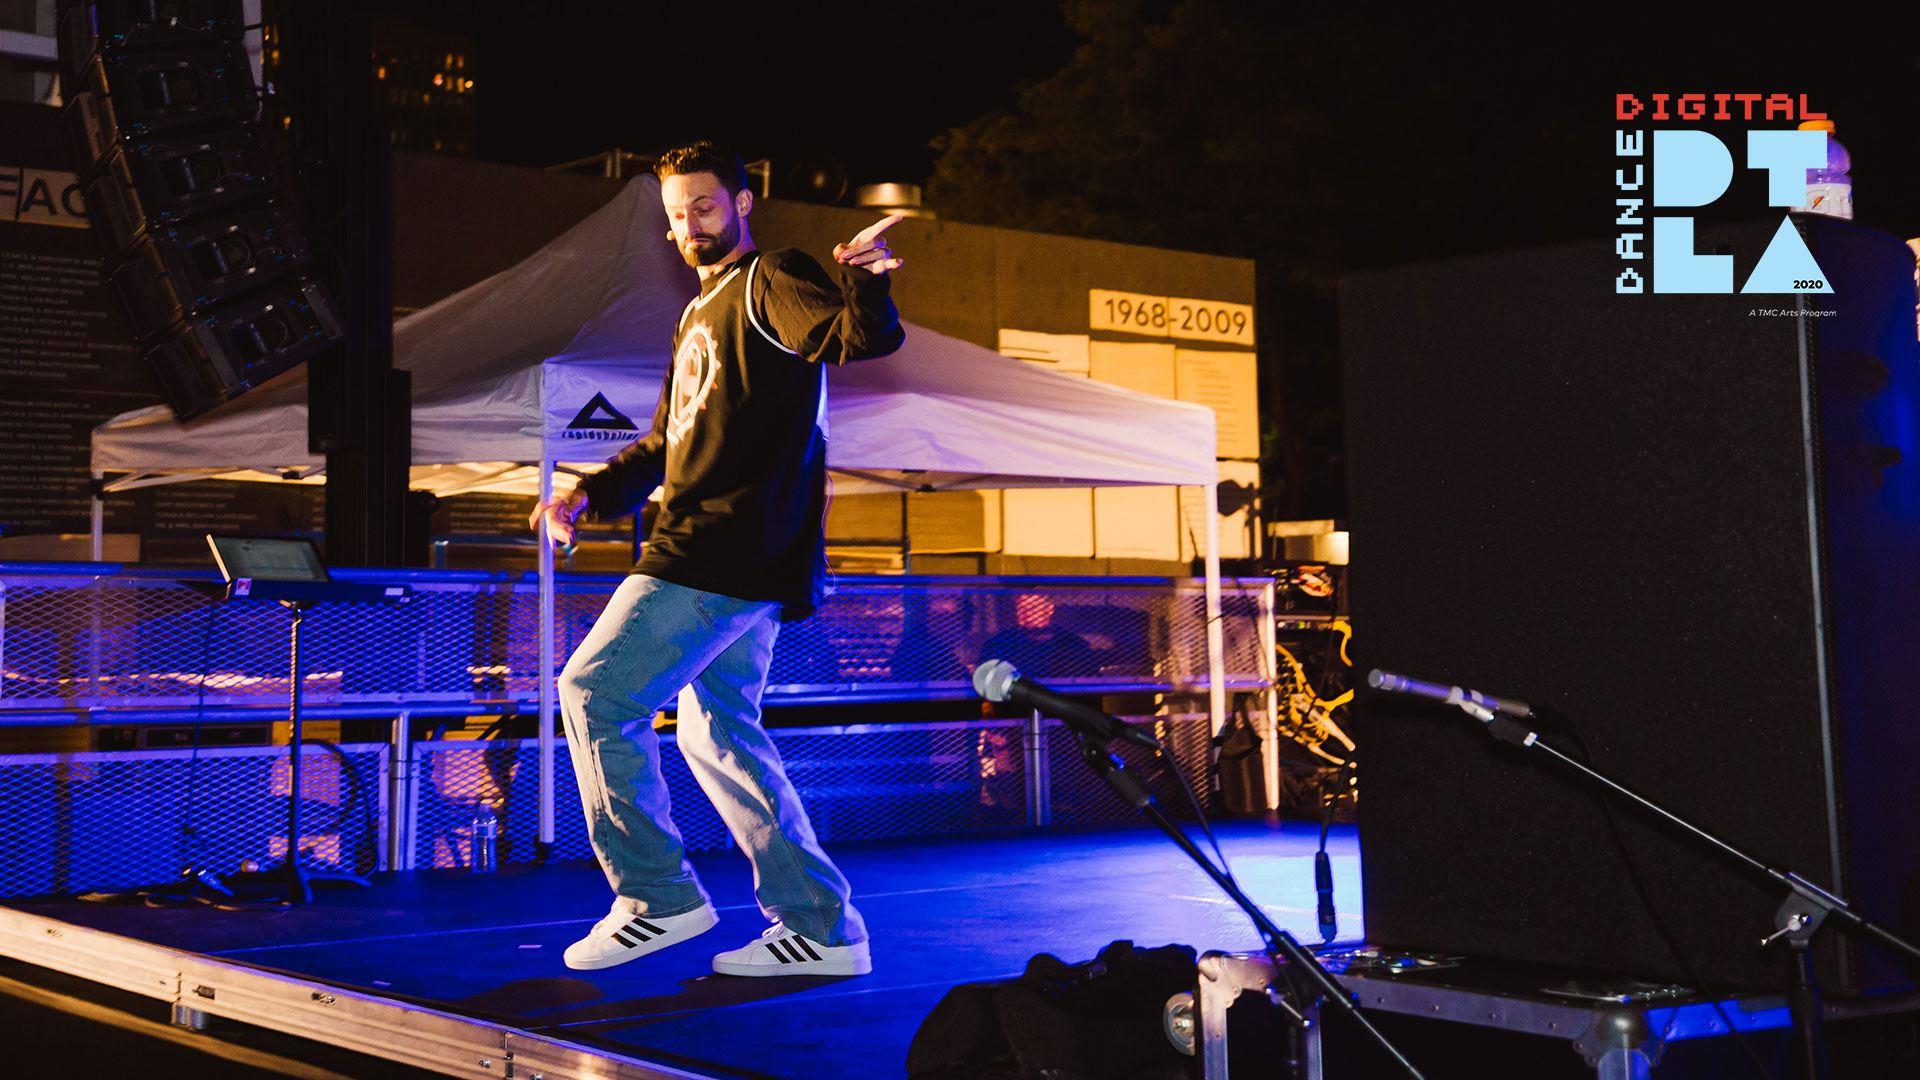 The Music Center's Digital Dance DTLA: Motown